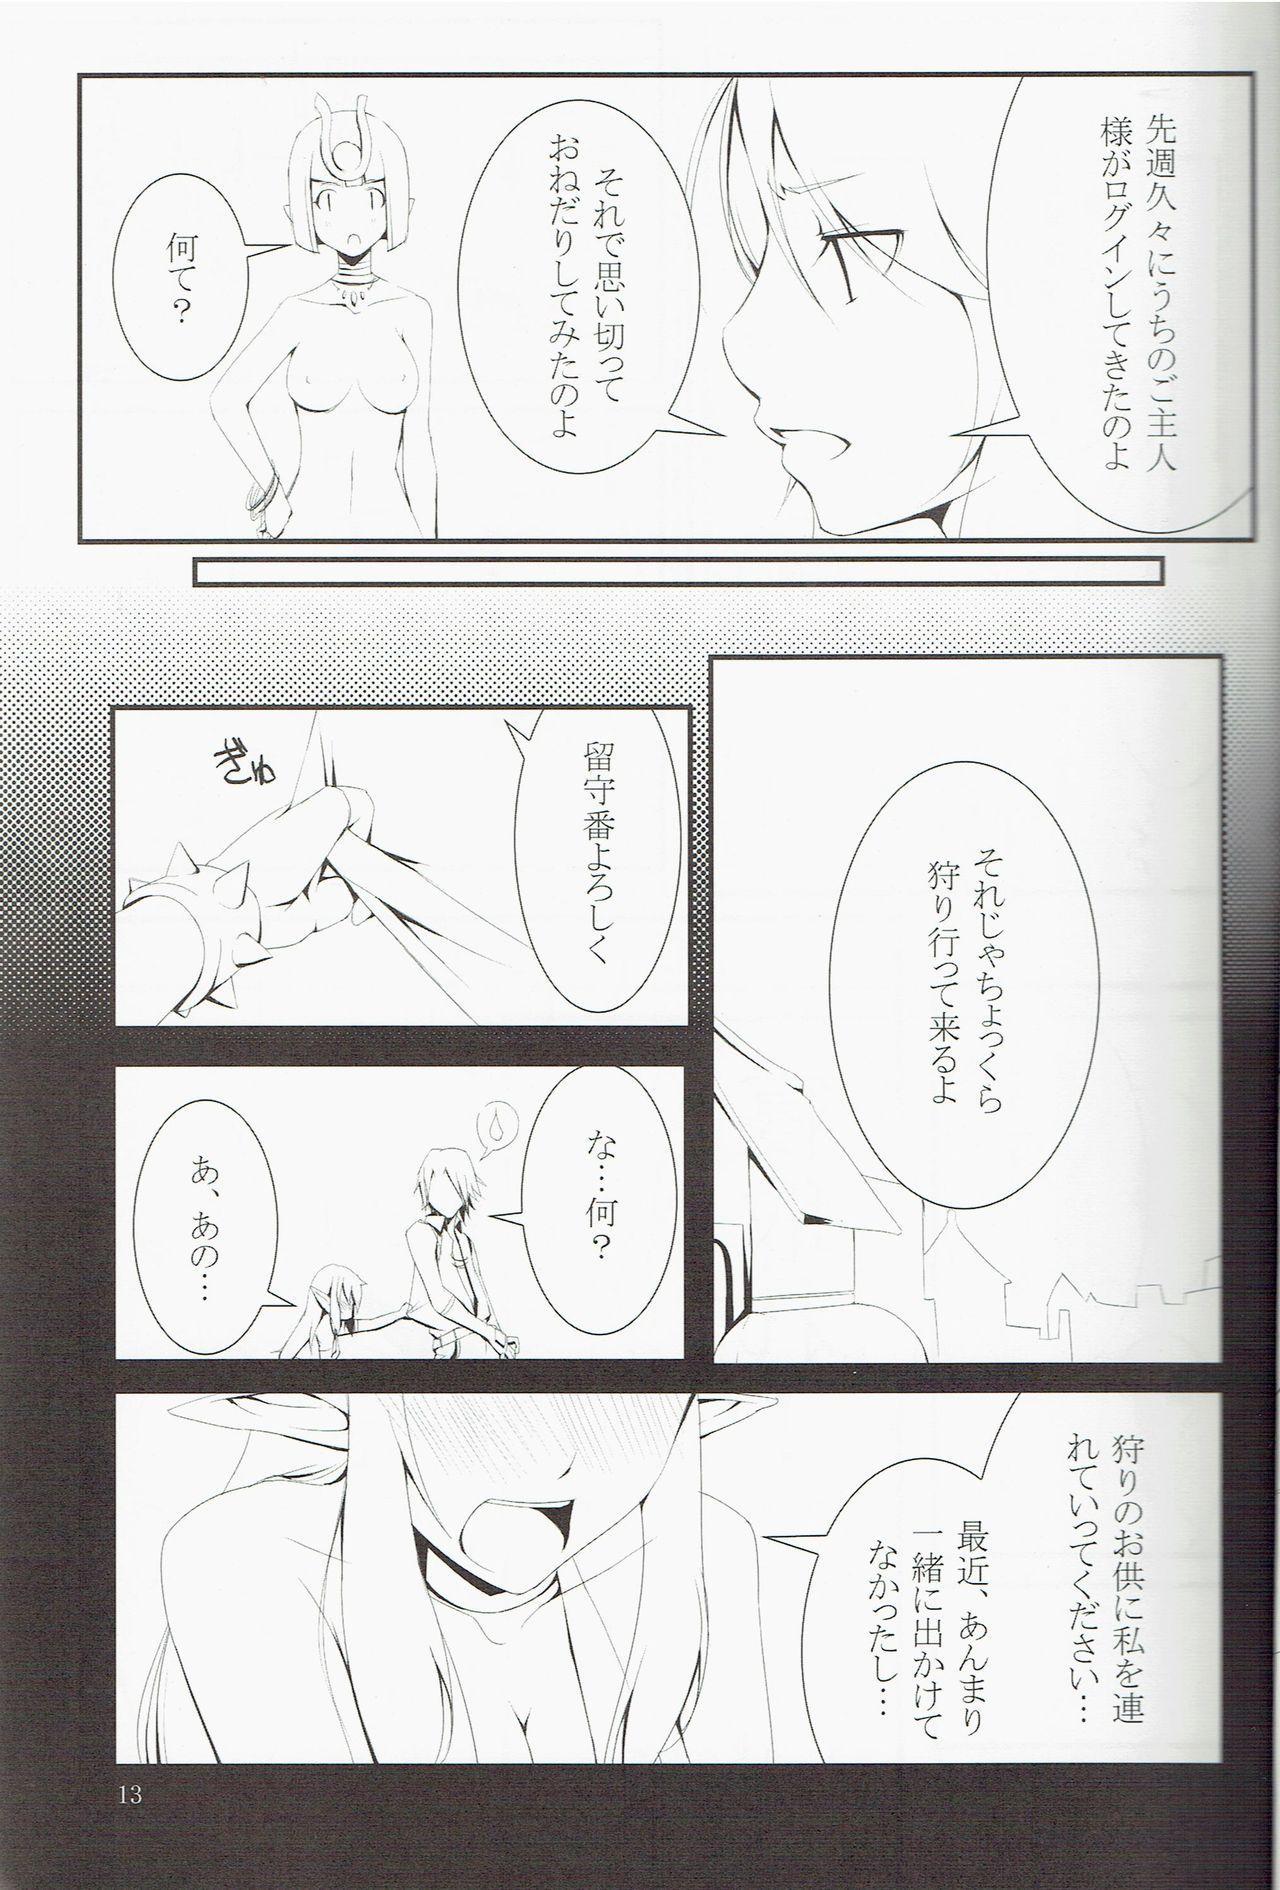 Pet Tachi no Yūutsu 11